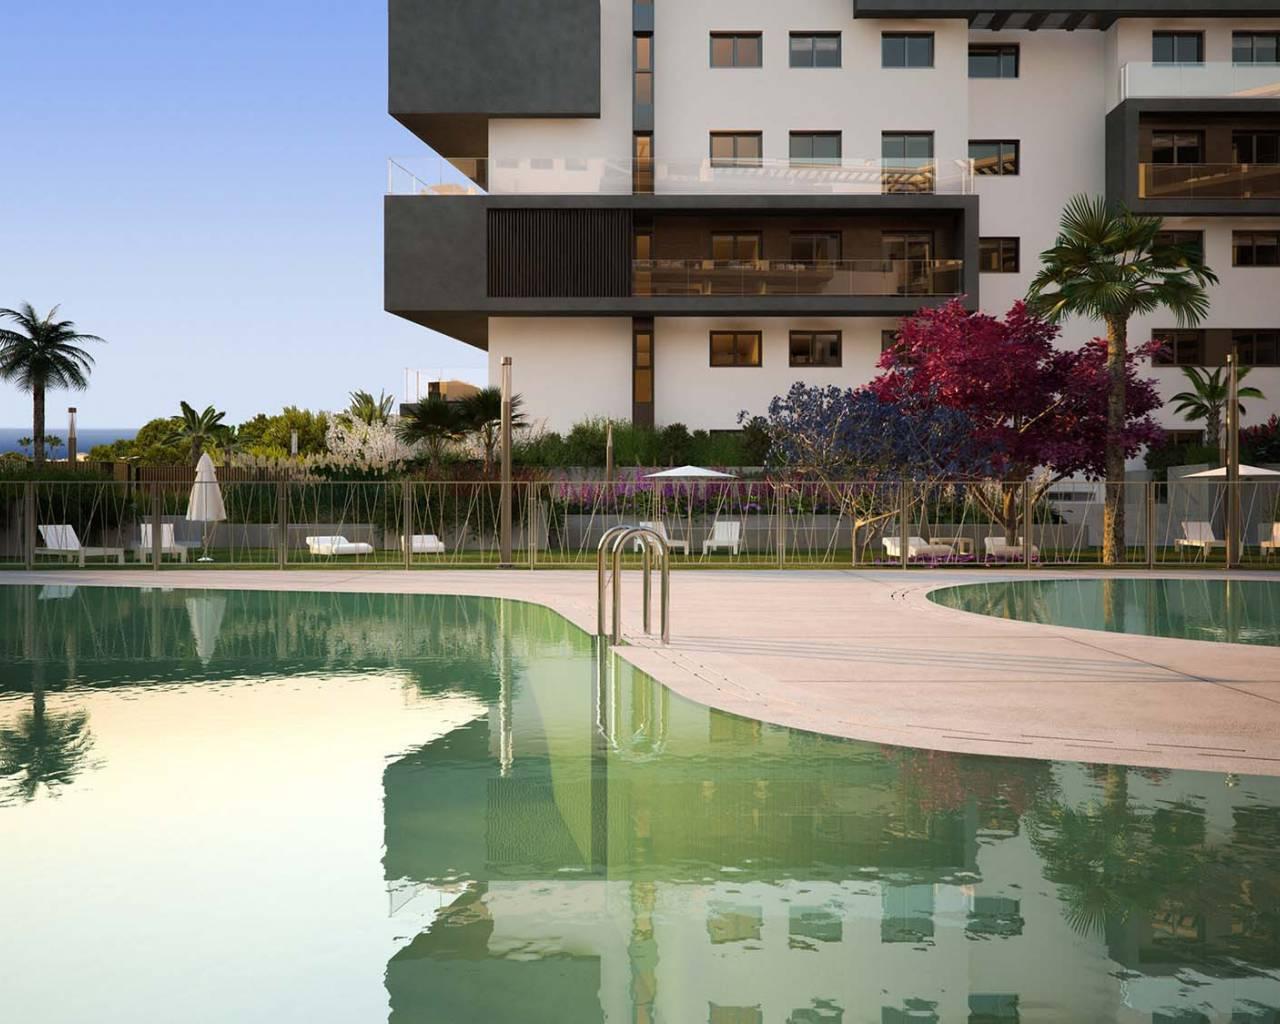 nieuwbouw-appartement-orihuela-costa-campoamor_5588_xl